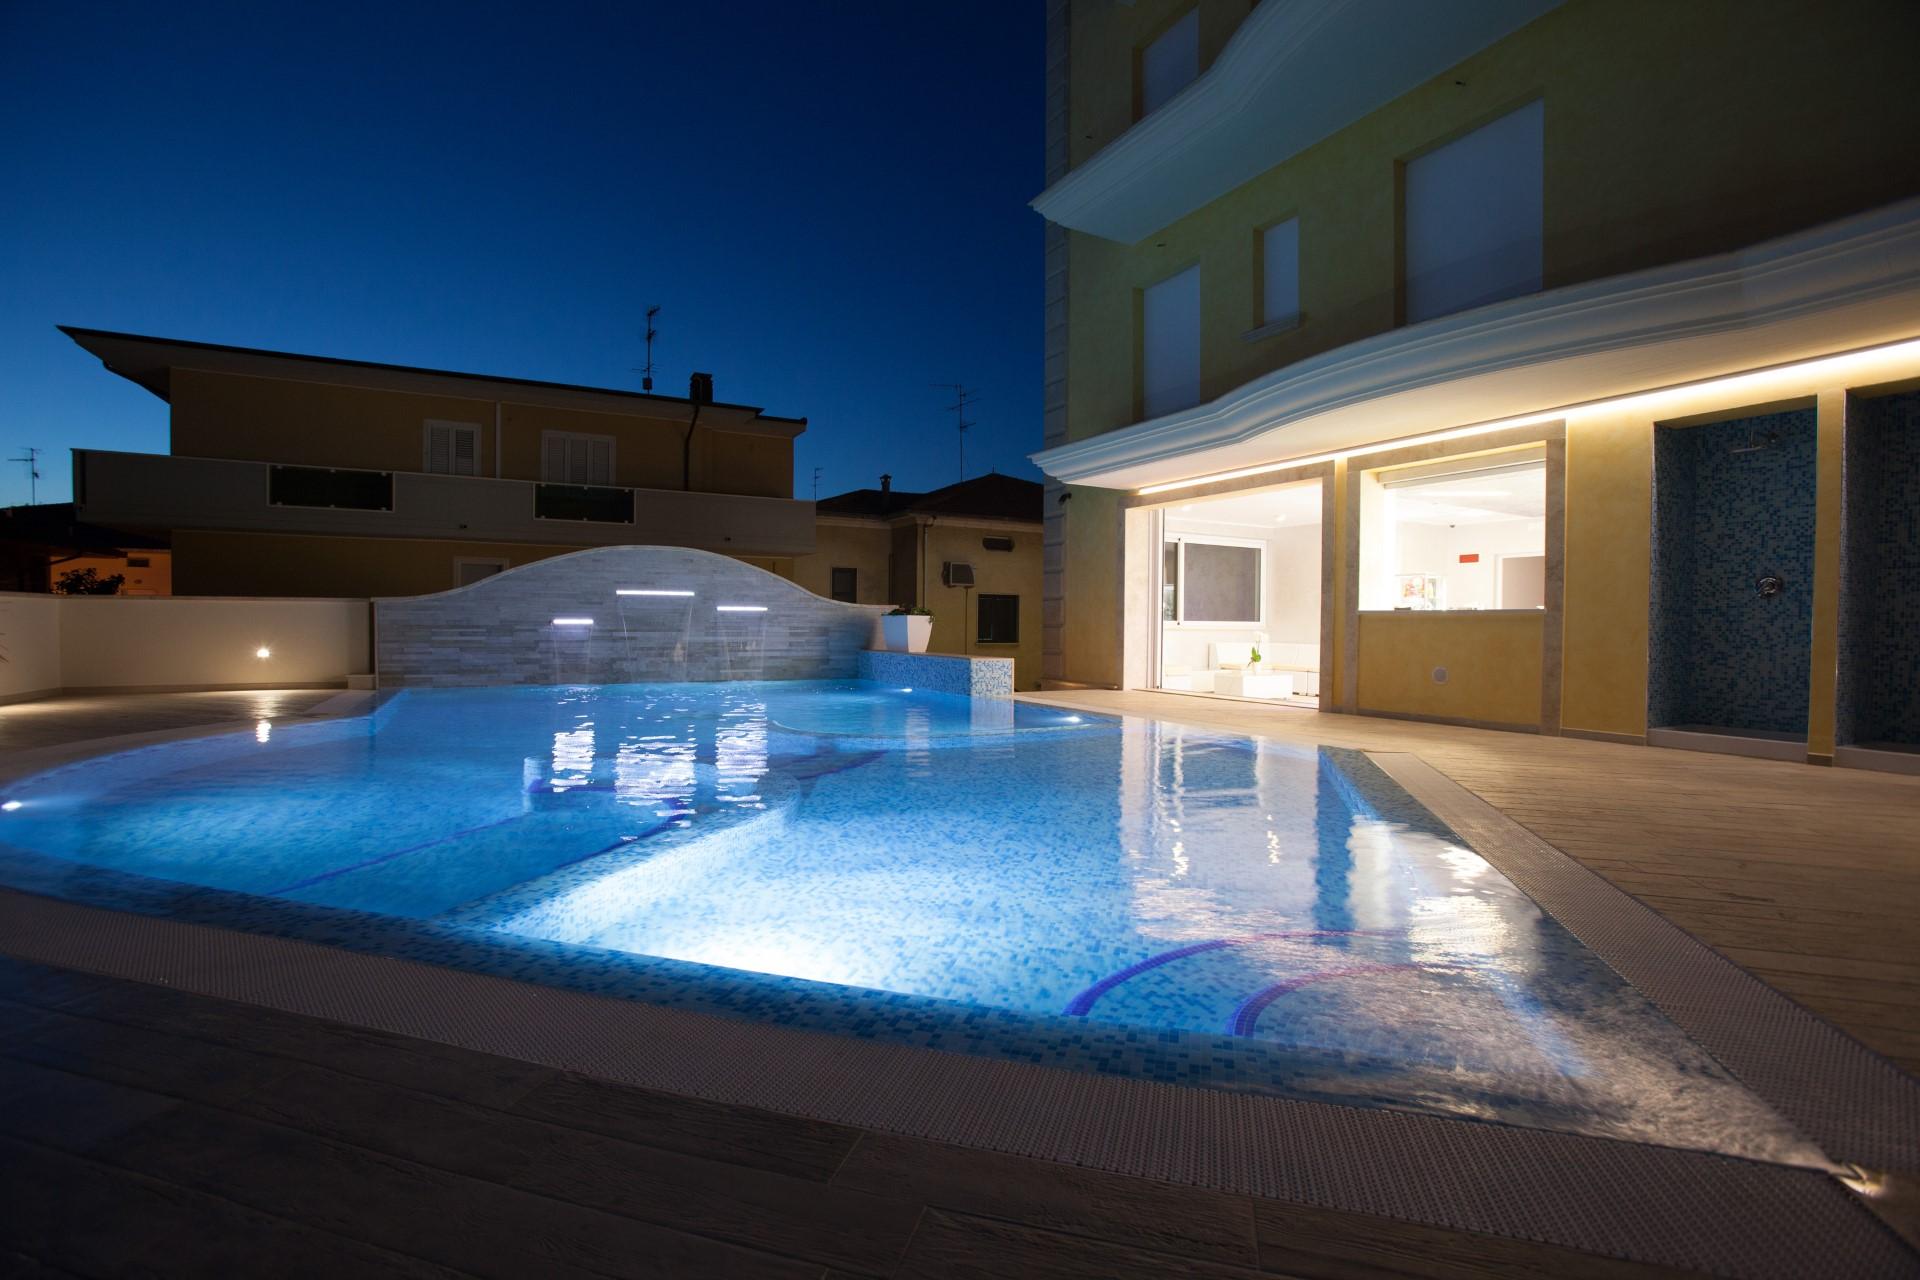 piscina notte hotel borcay alba adriatica